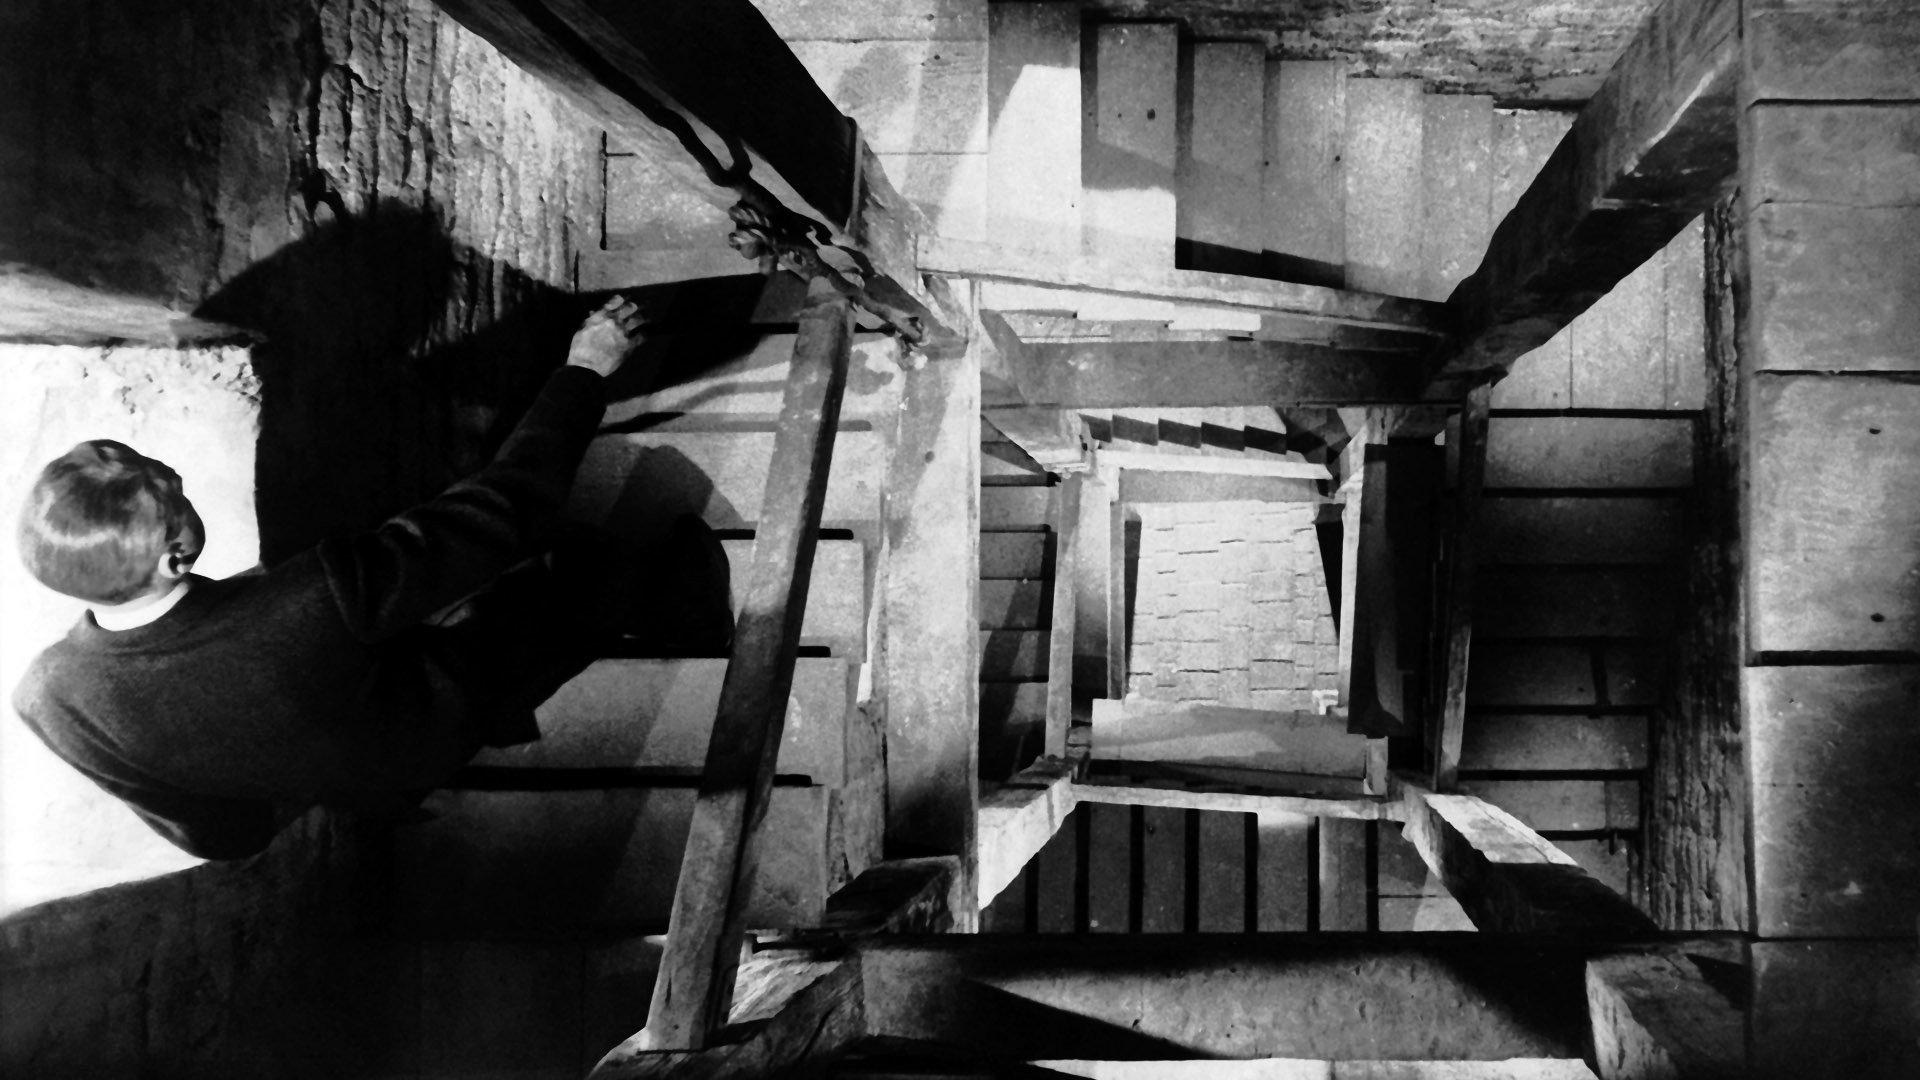 Must see Wallpaper Movie Vertigo - thumb-1920-611038  HD_751023.jpg